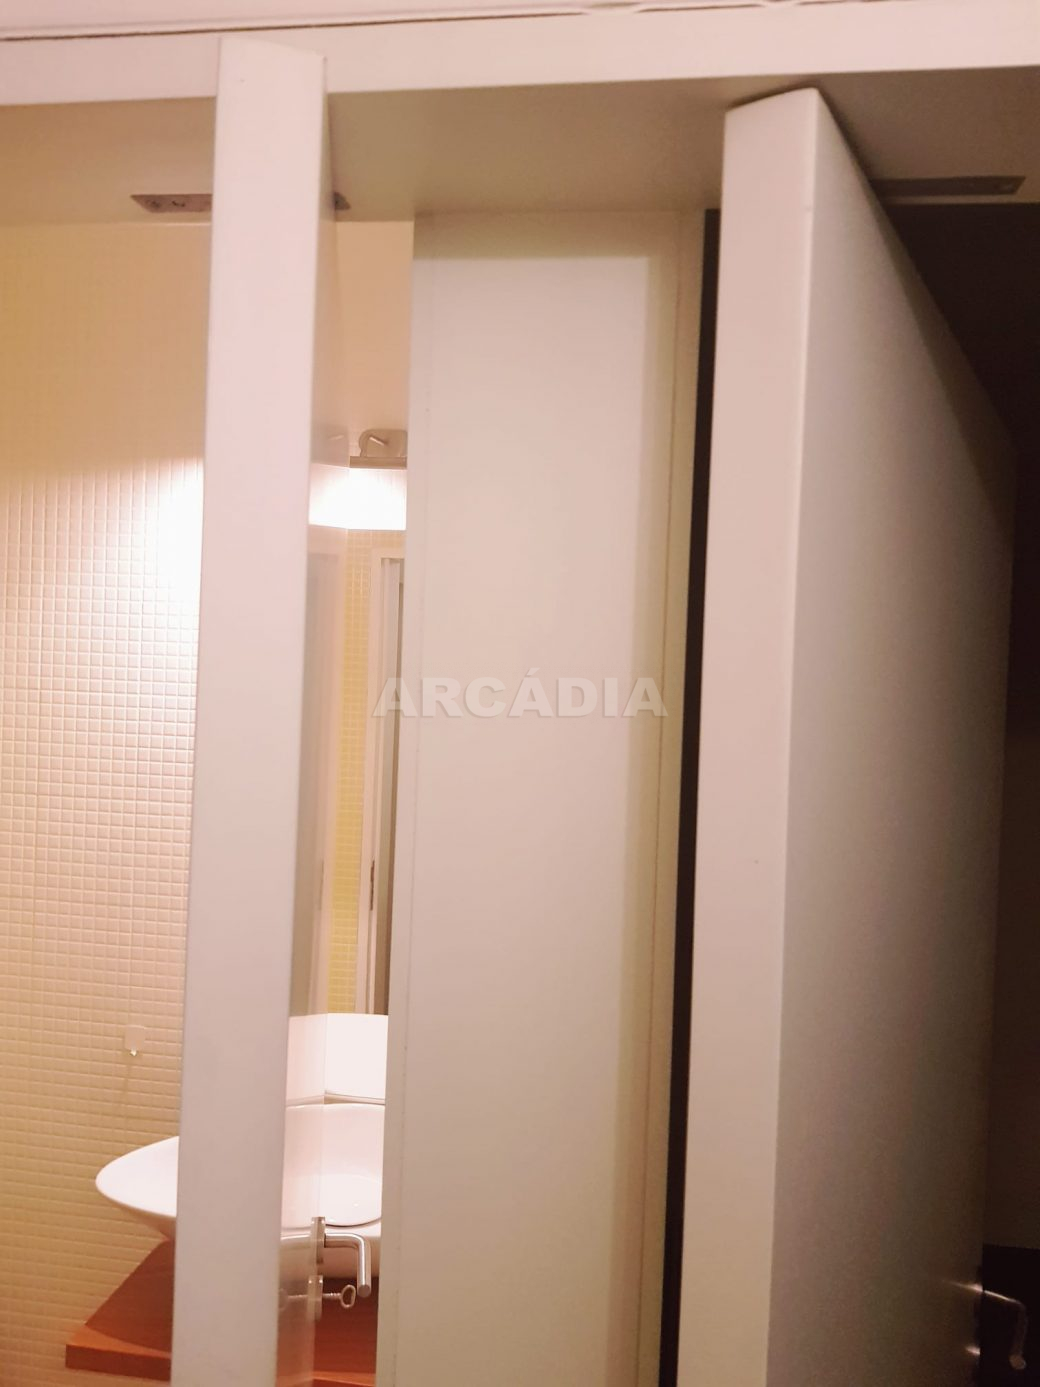 arcadia-imobiliaria-braga-apartamento-no-centro-historico-de-braga-tipo-2-para-compra-20